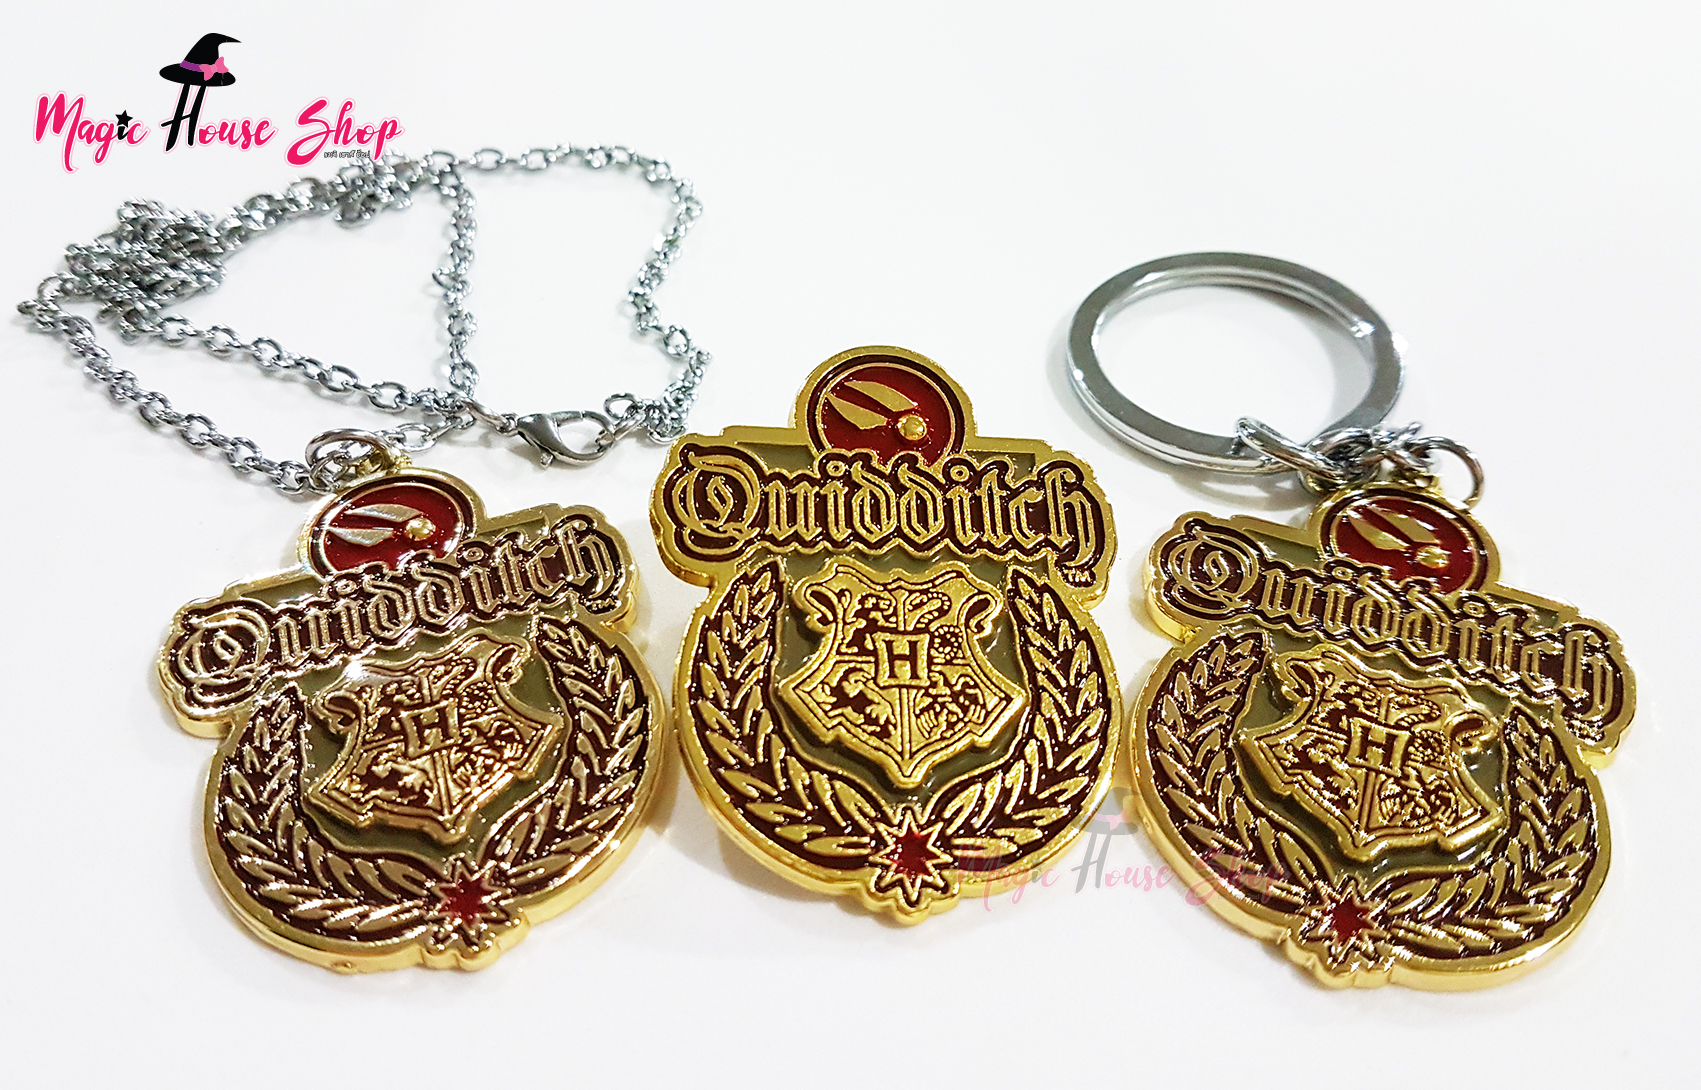 Quidditch ควิดดิช : สร้อยคอ พวงกุญแจ เข็มกลัด